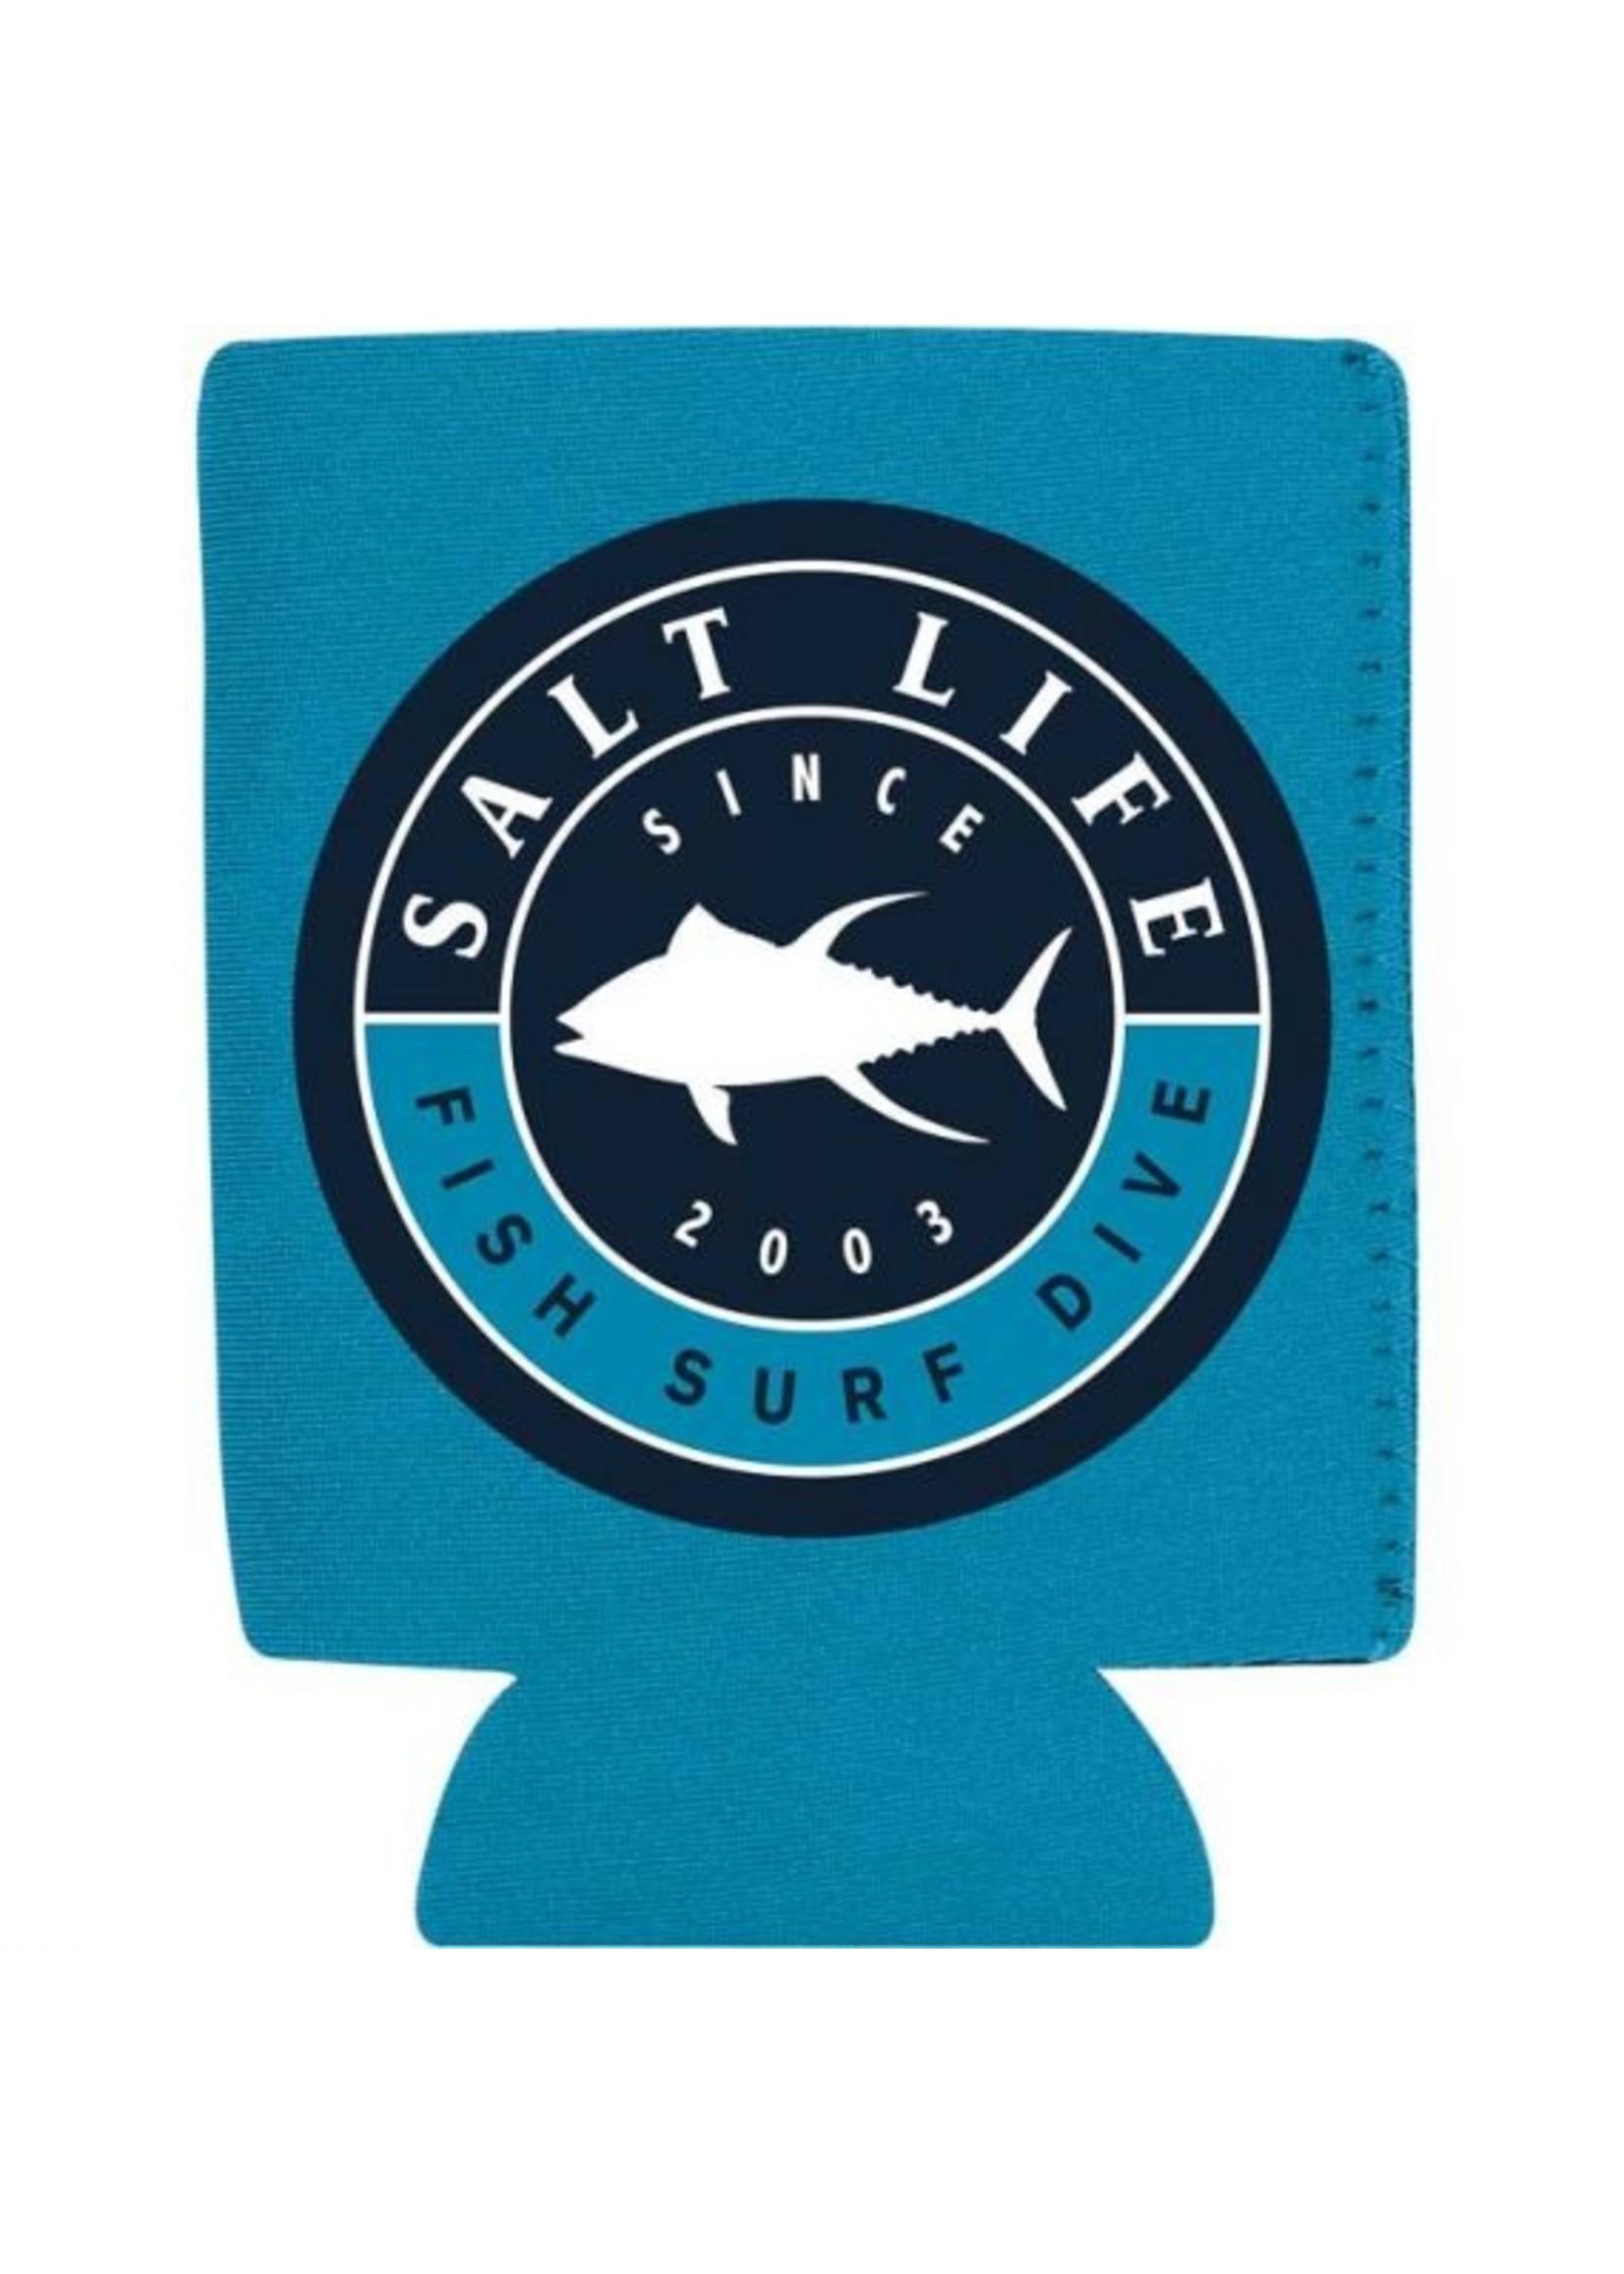 Salt Life Cast Can Holder